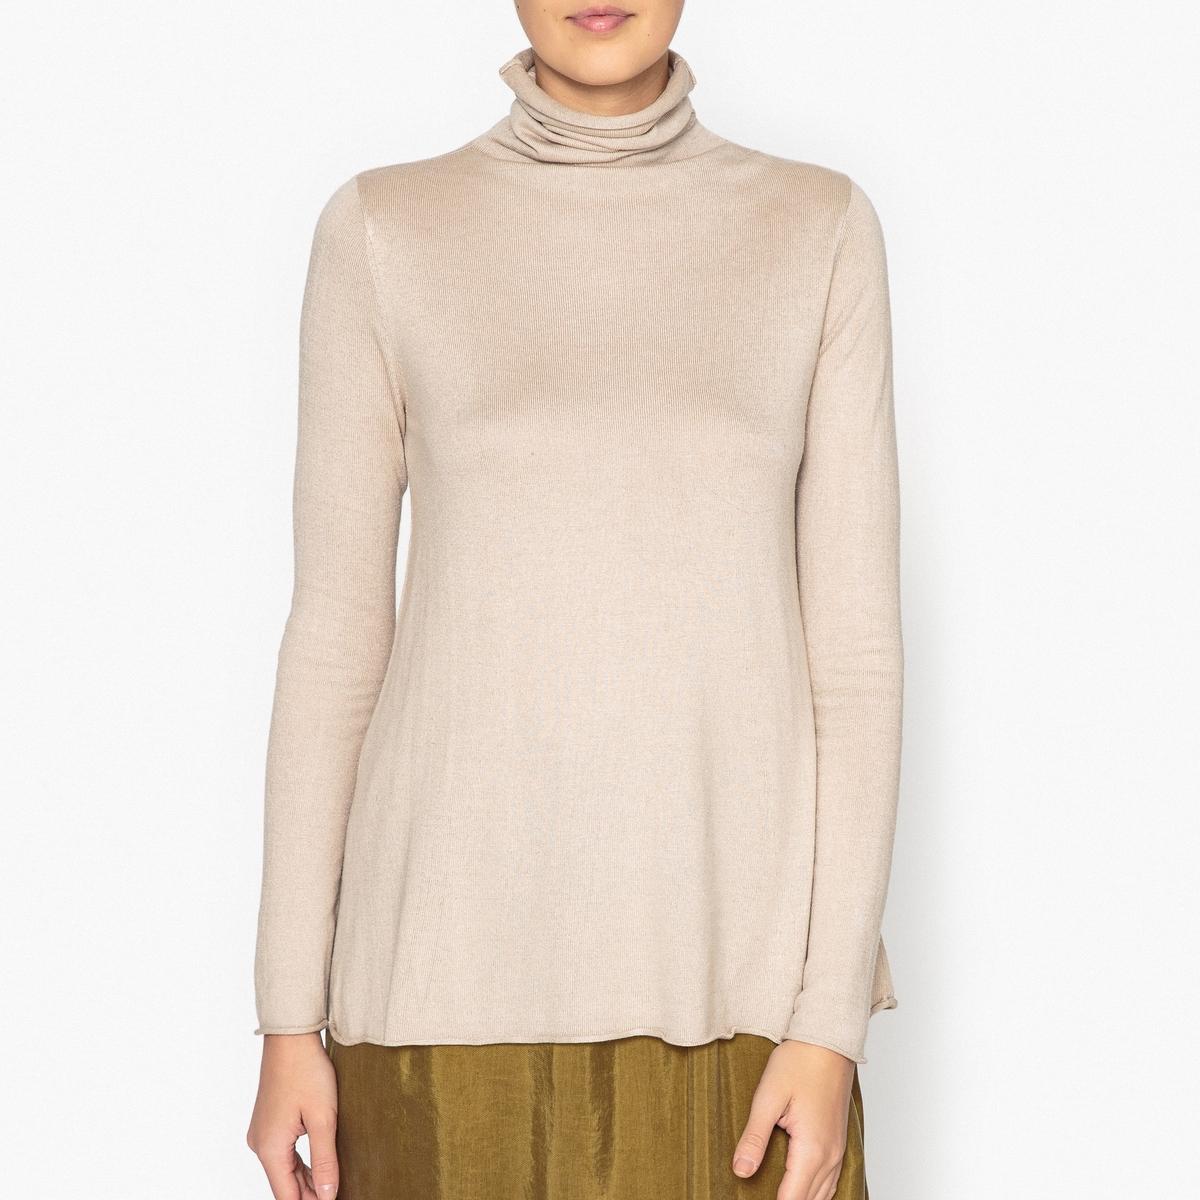 Пуловер с воротником с отворотом LOBAISLAND пуловер свободный с воротником с отворотом plunkett